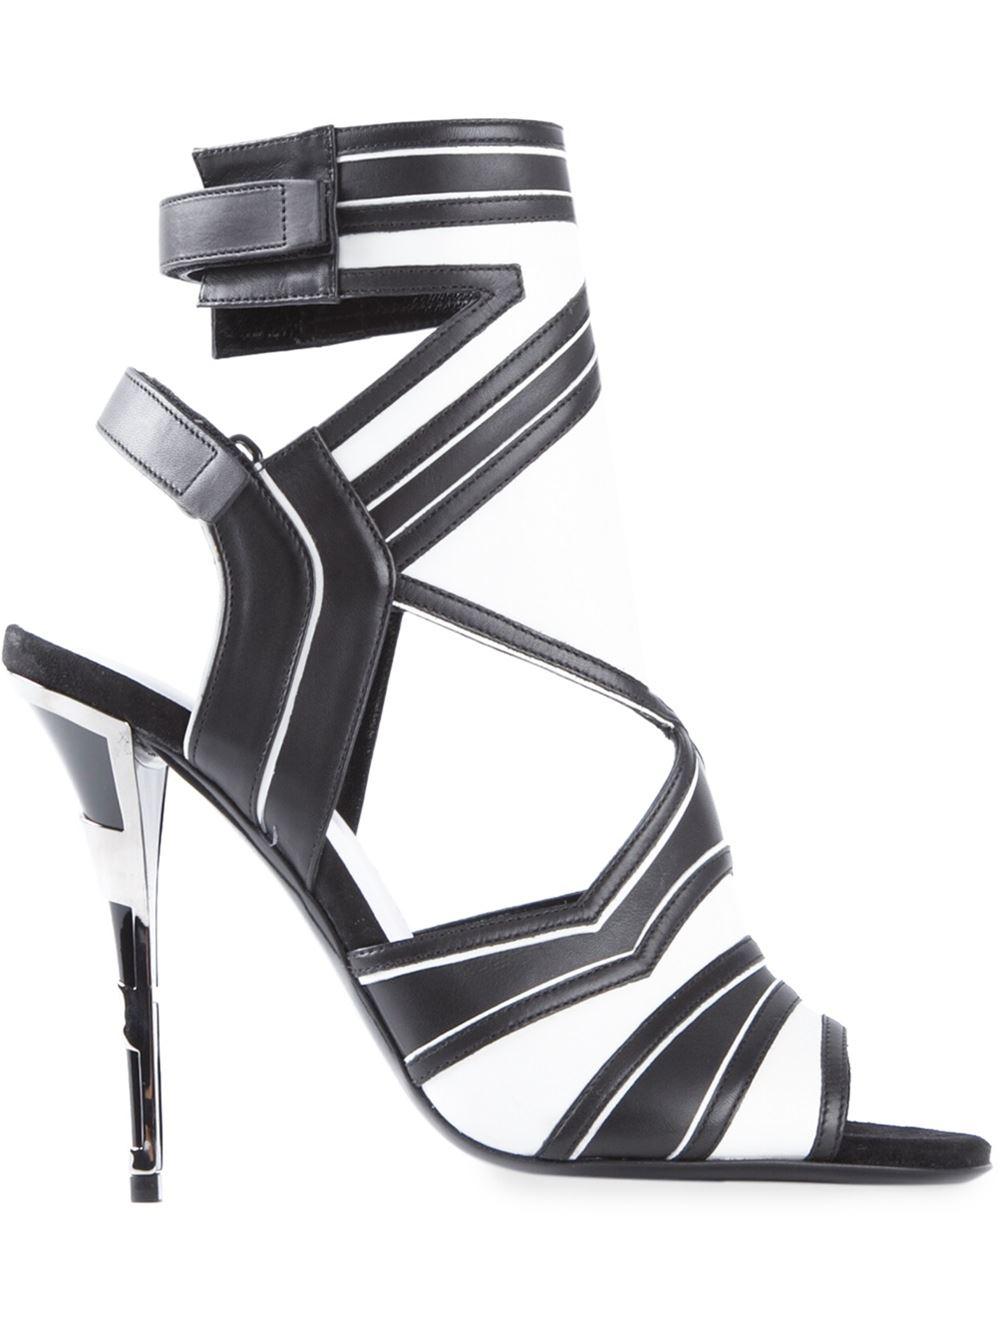 4879026fe Lyst - Balmain Strappy Sandals in Black